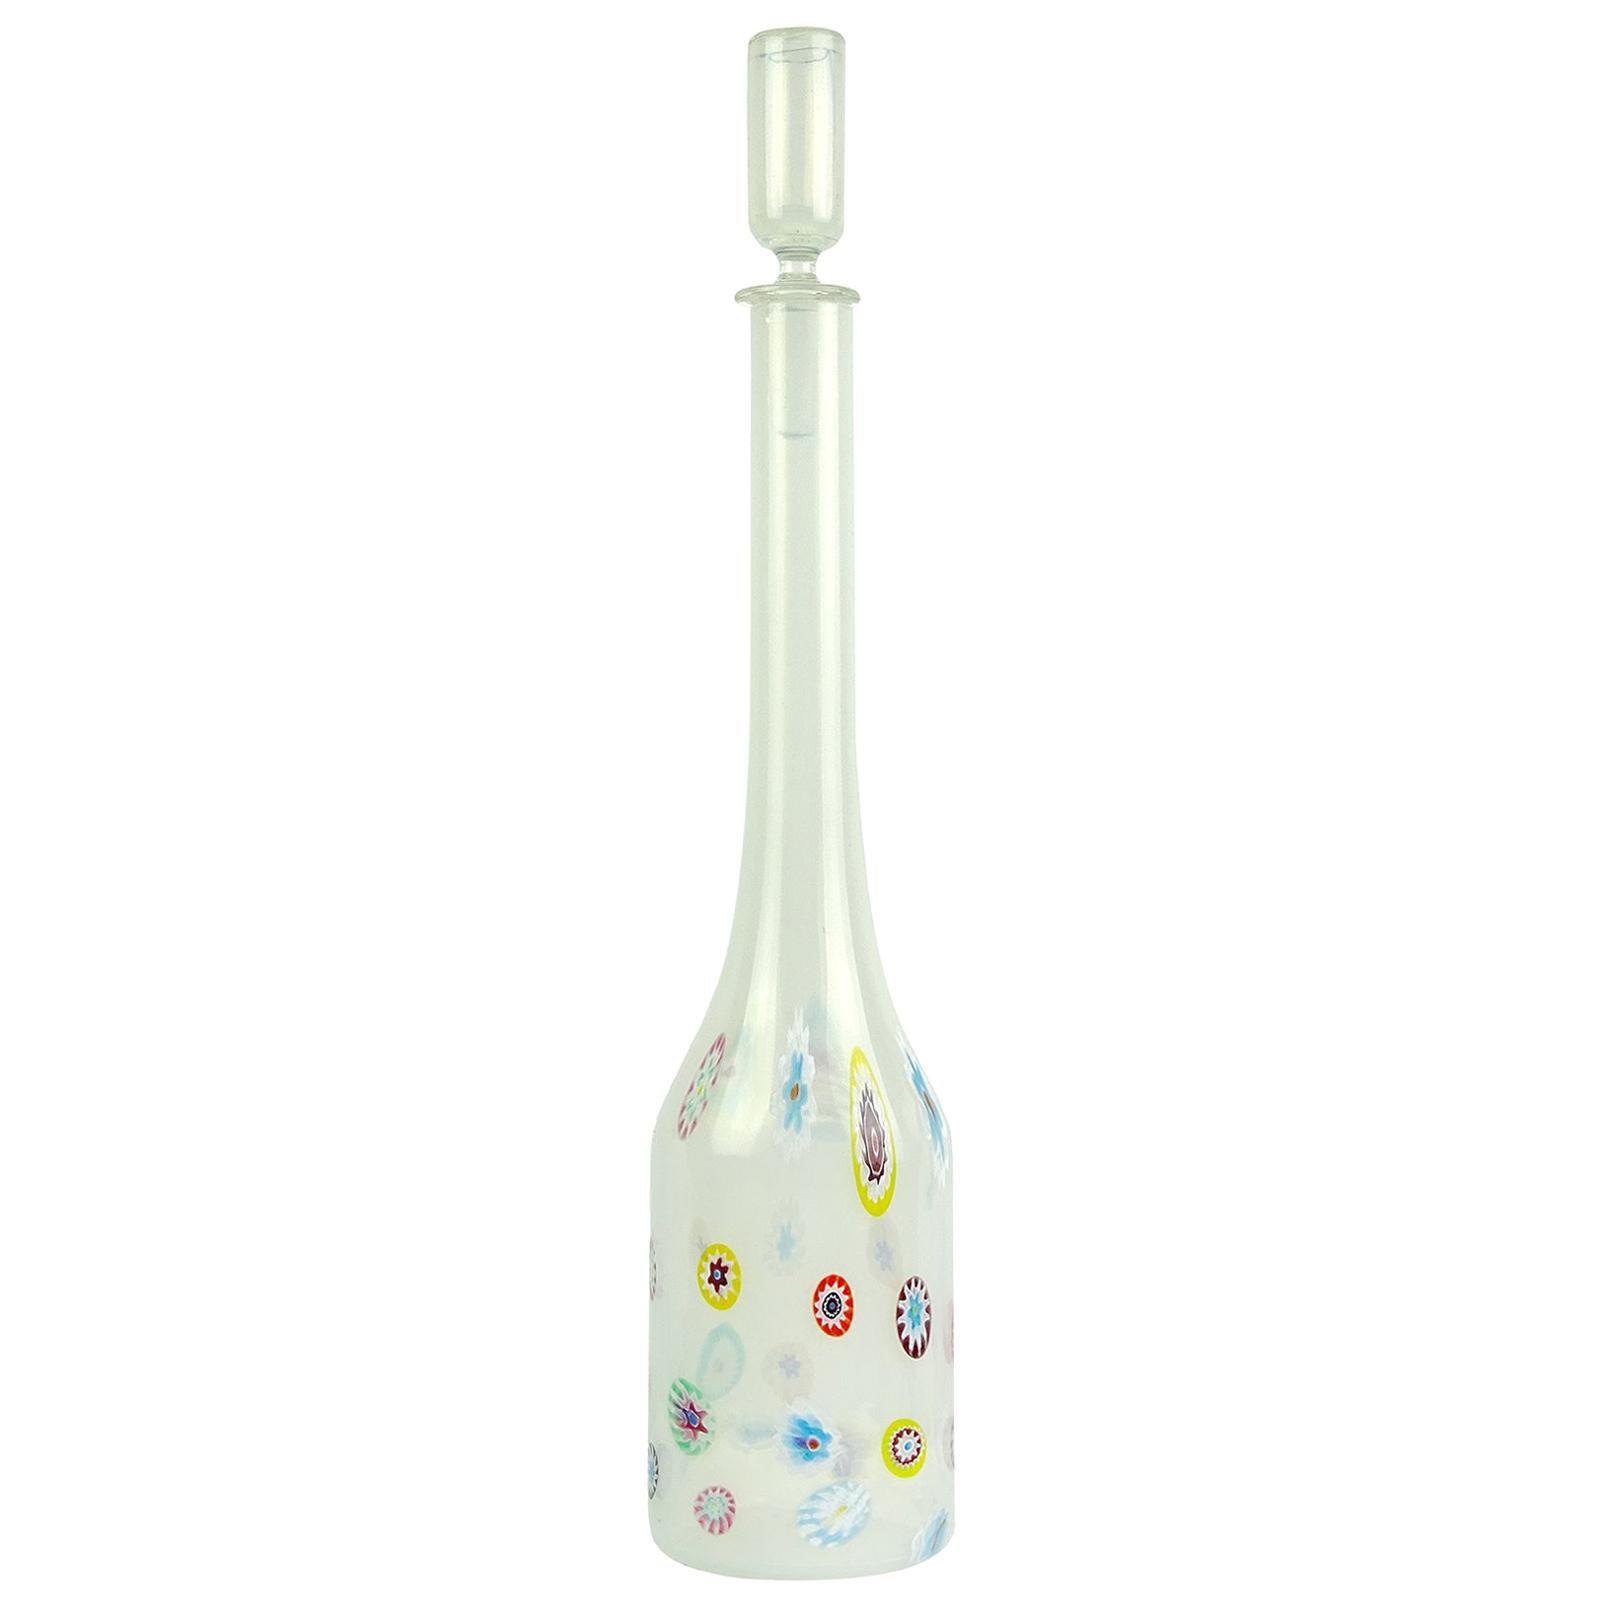 Fratelli Toso Murano White Opalescent Flower Murrine Italian Art Glass Decanter